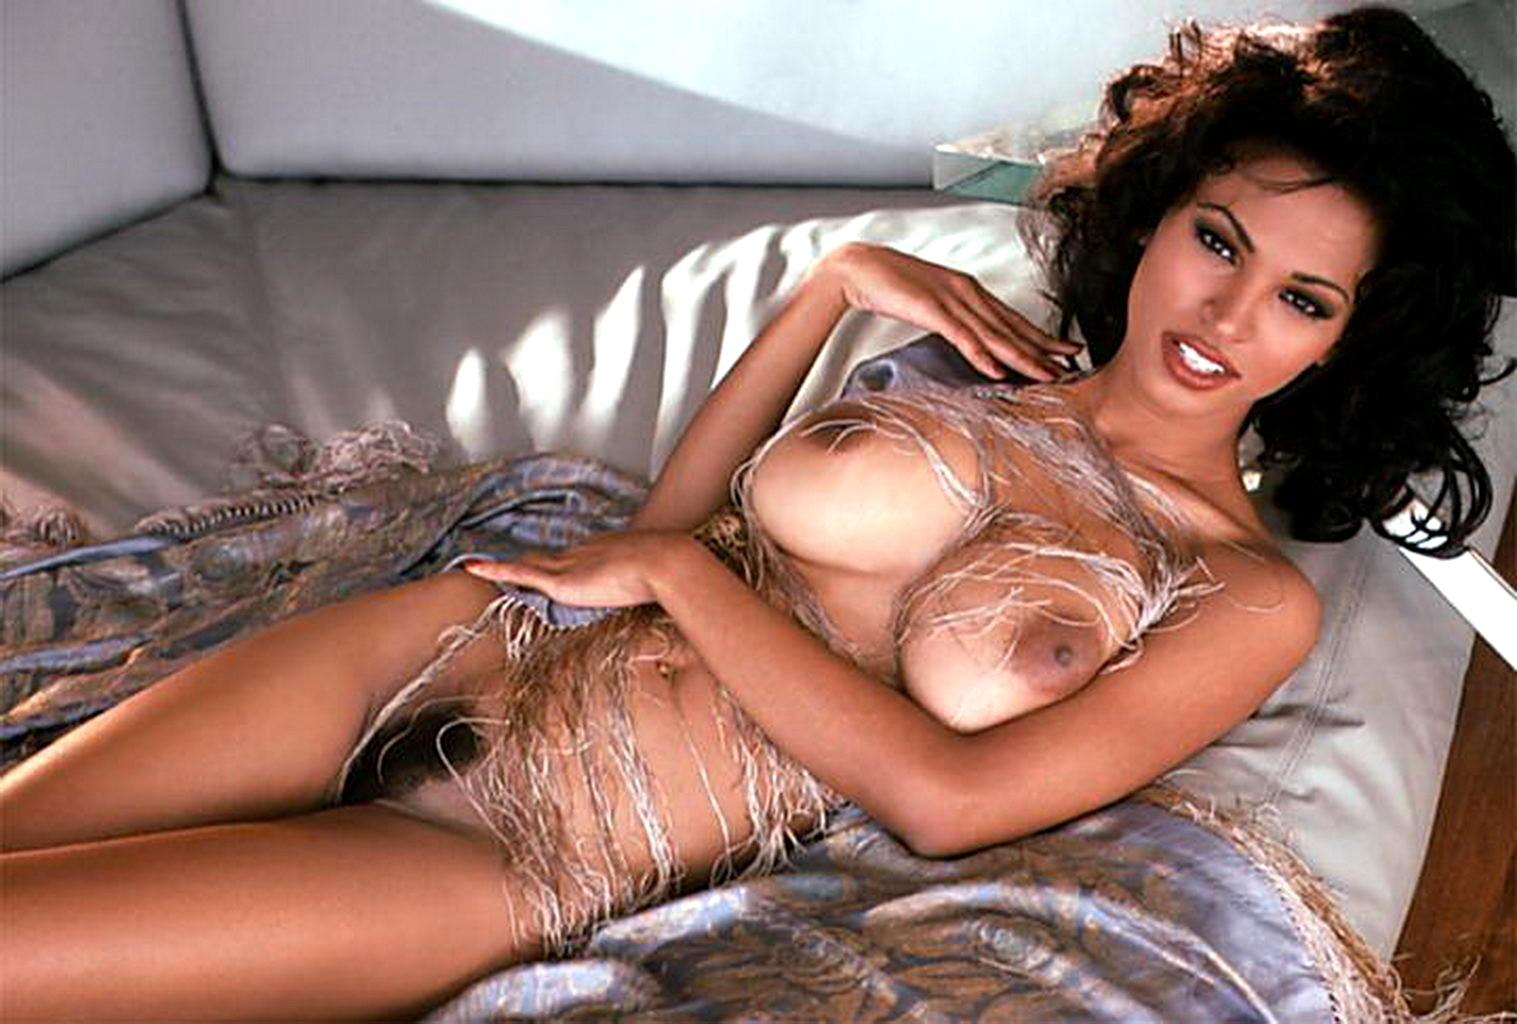 girls-whitney-houston-nude-sex-pics-chocolate-sex